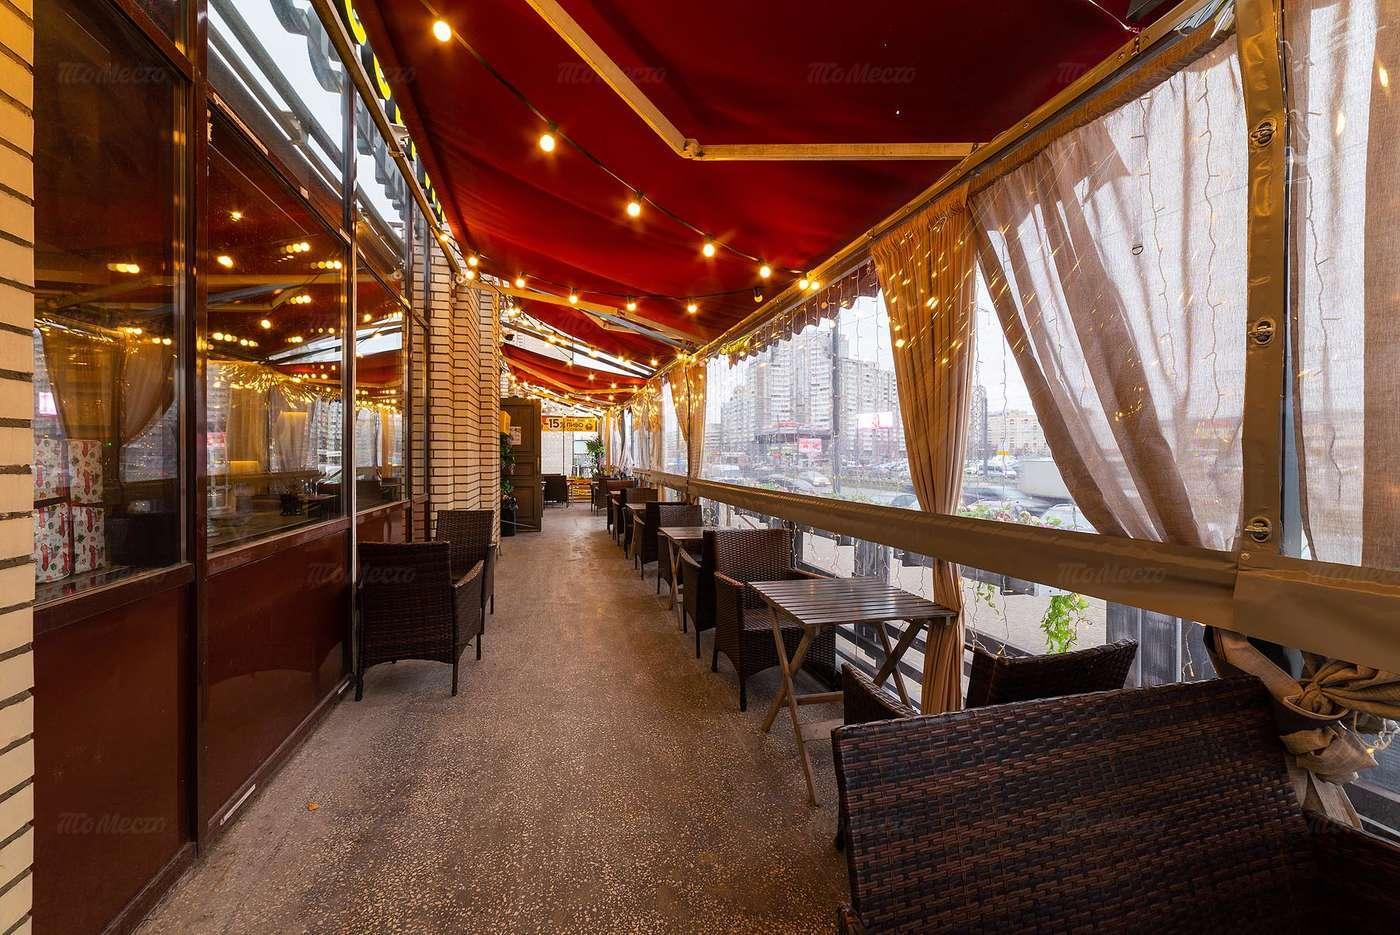 Ресторан Брассерия Крик (Brasserie Kriek) на Коломяжском проспекте фото 10